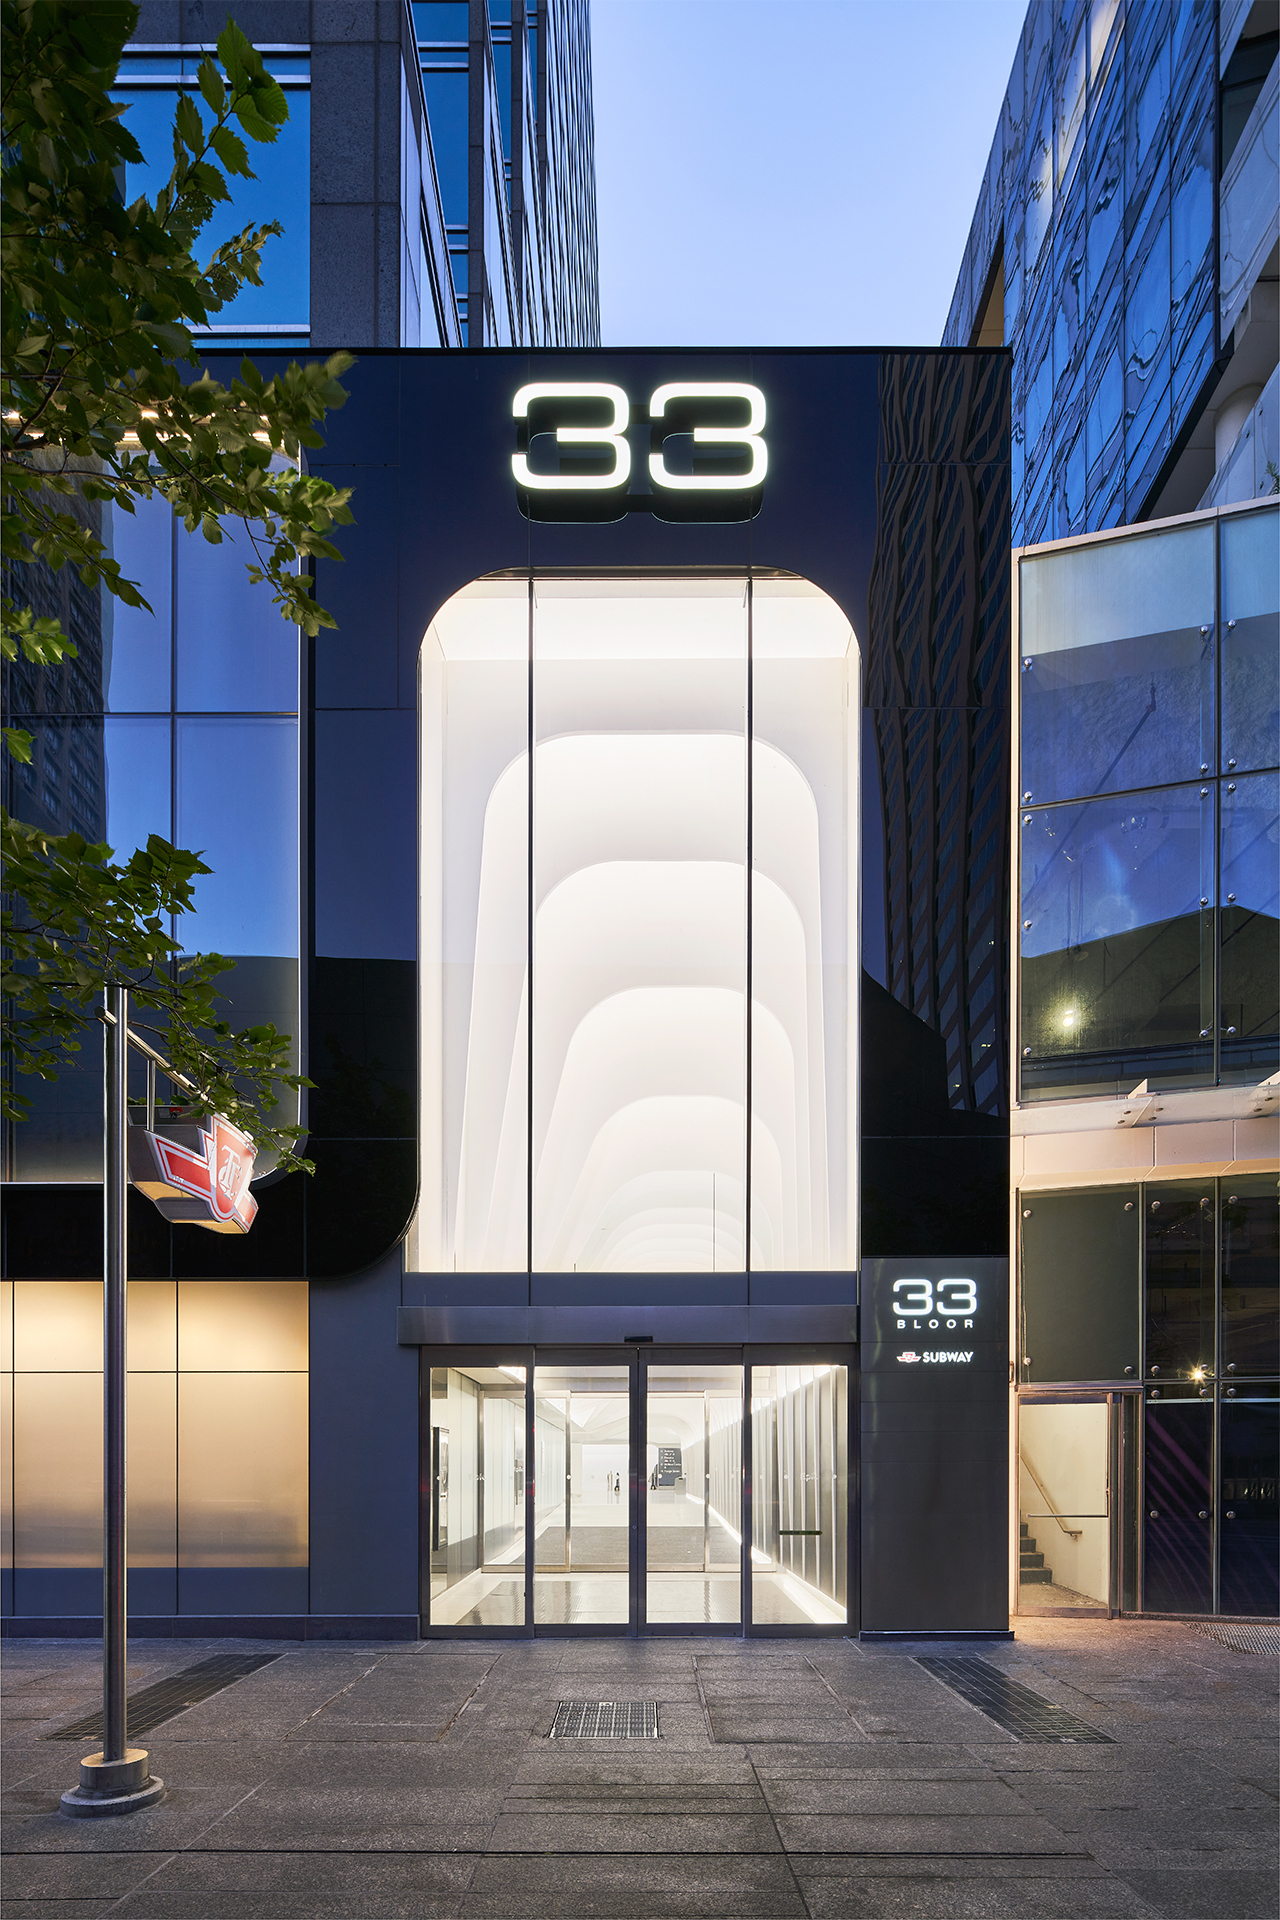 33 Bloor Street East, Epic Investment Services, WZMH, CBRE, Toronto